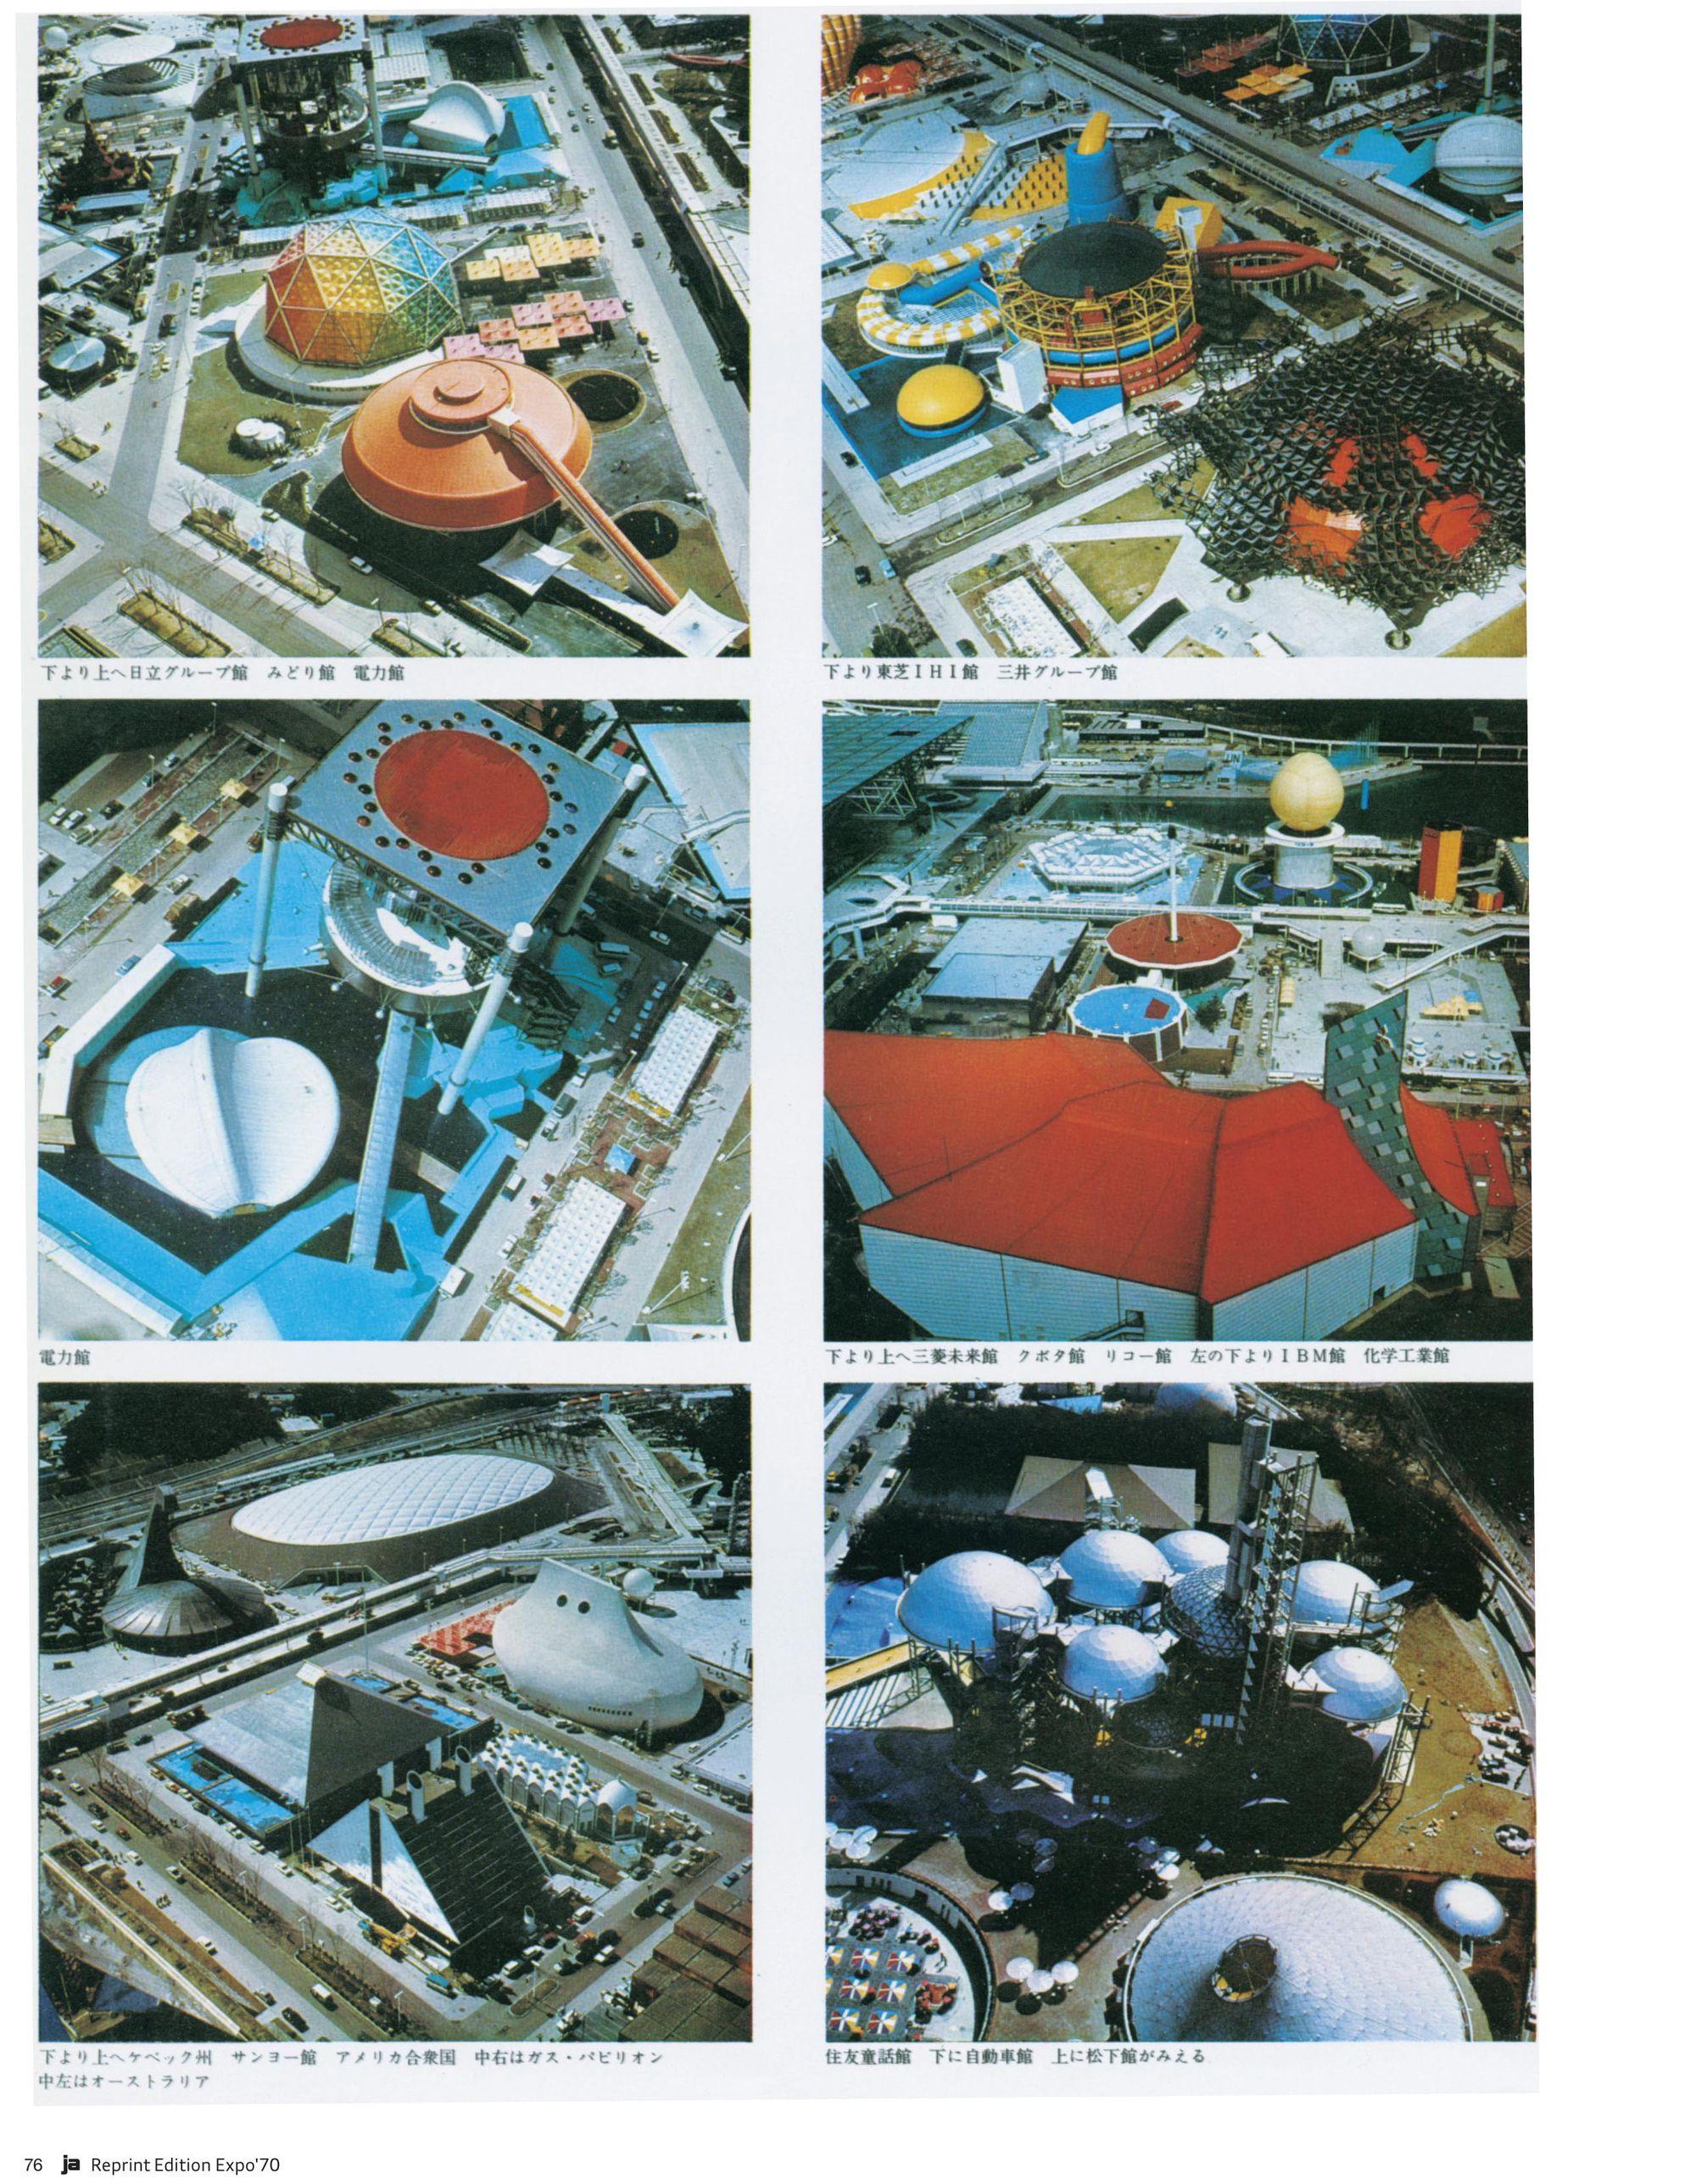 Ja 113 Spring 2019 Reprint Edition Expo 70 The Japan Architect Architecture Design Competition Design Competitions Expo